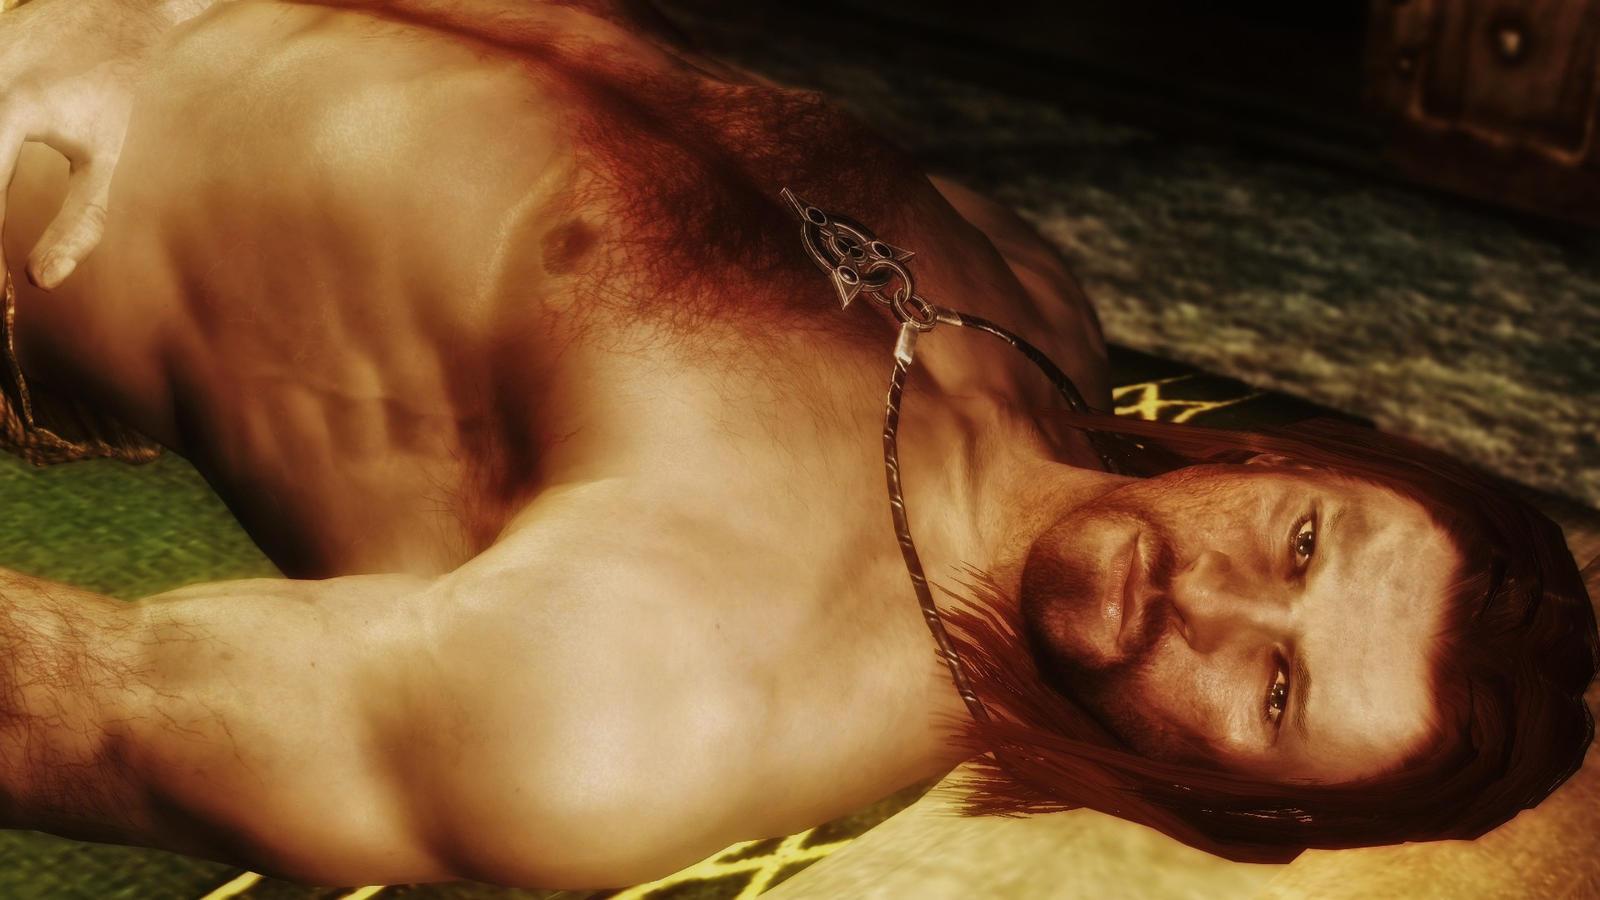 Shirtless Bryn by FireBreathingSkwirls